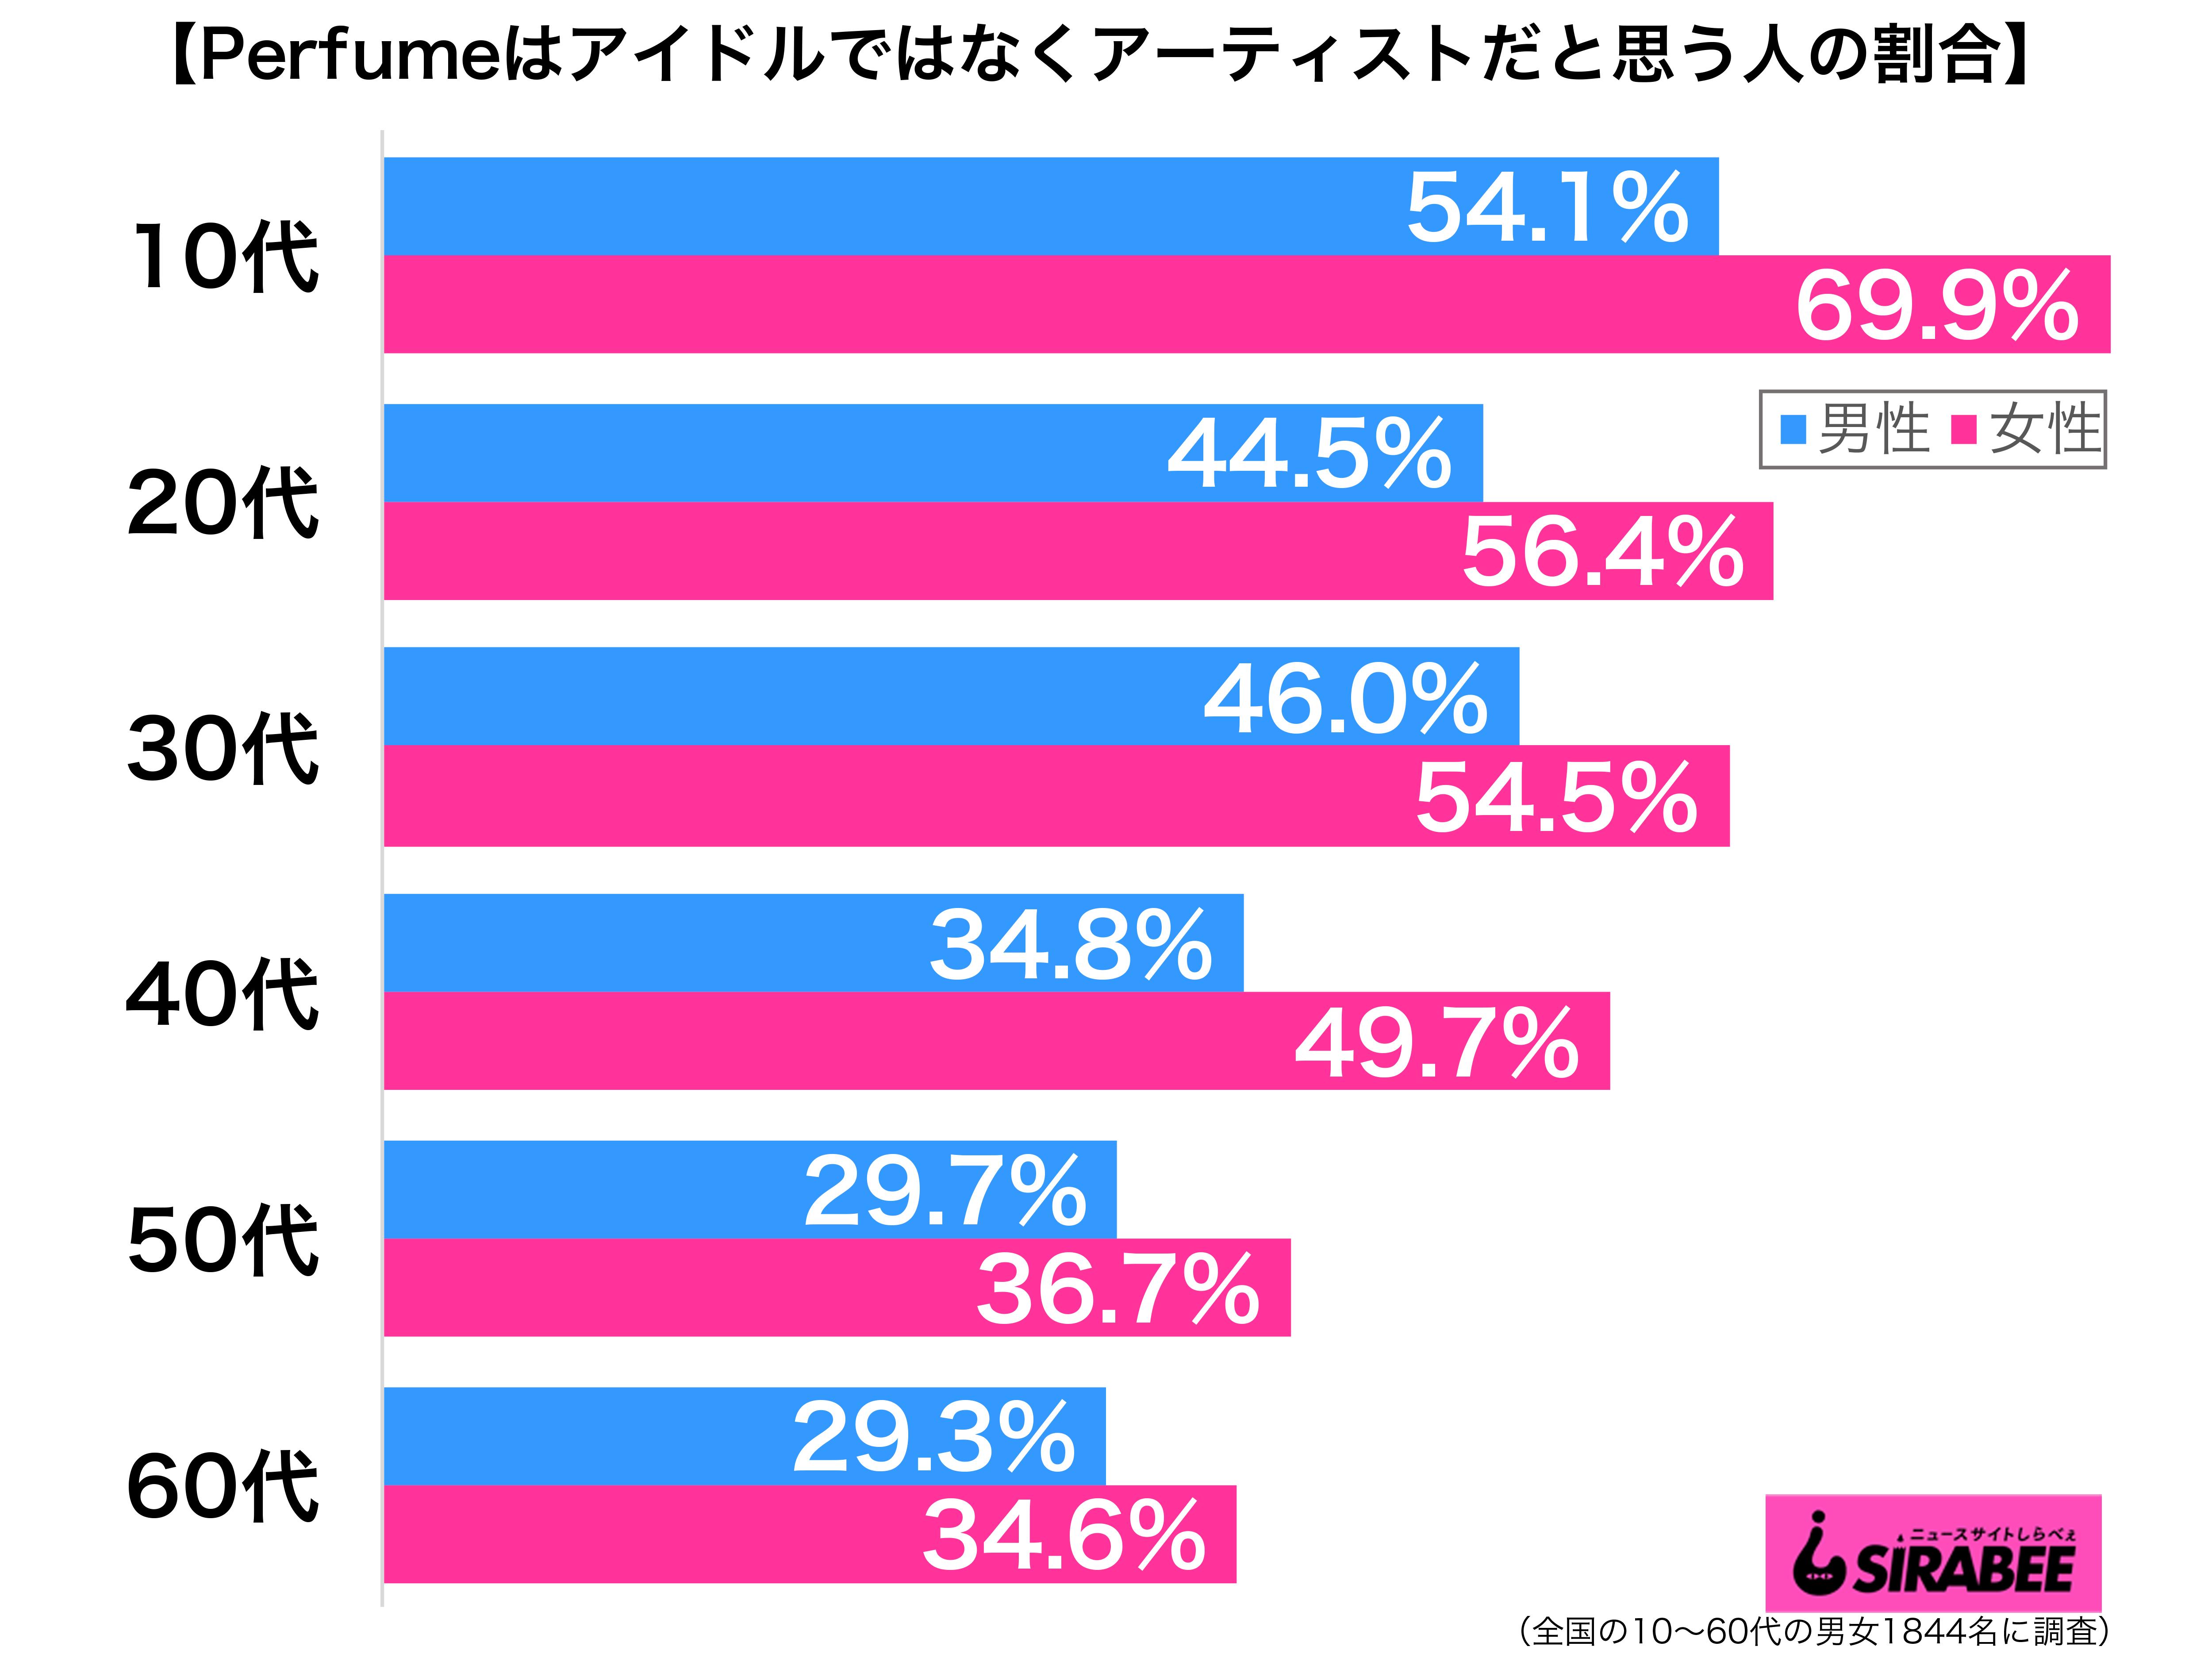 Perfumeはアイドルではなくアーティストだと思う性年代別グラフ